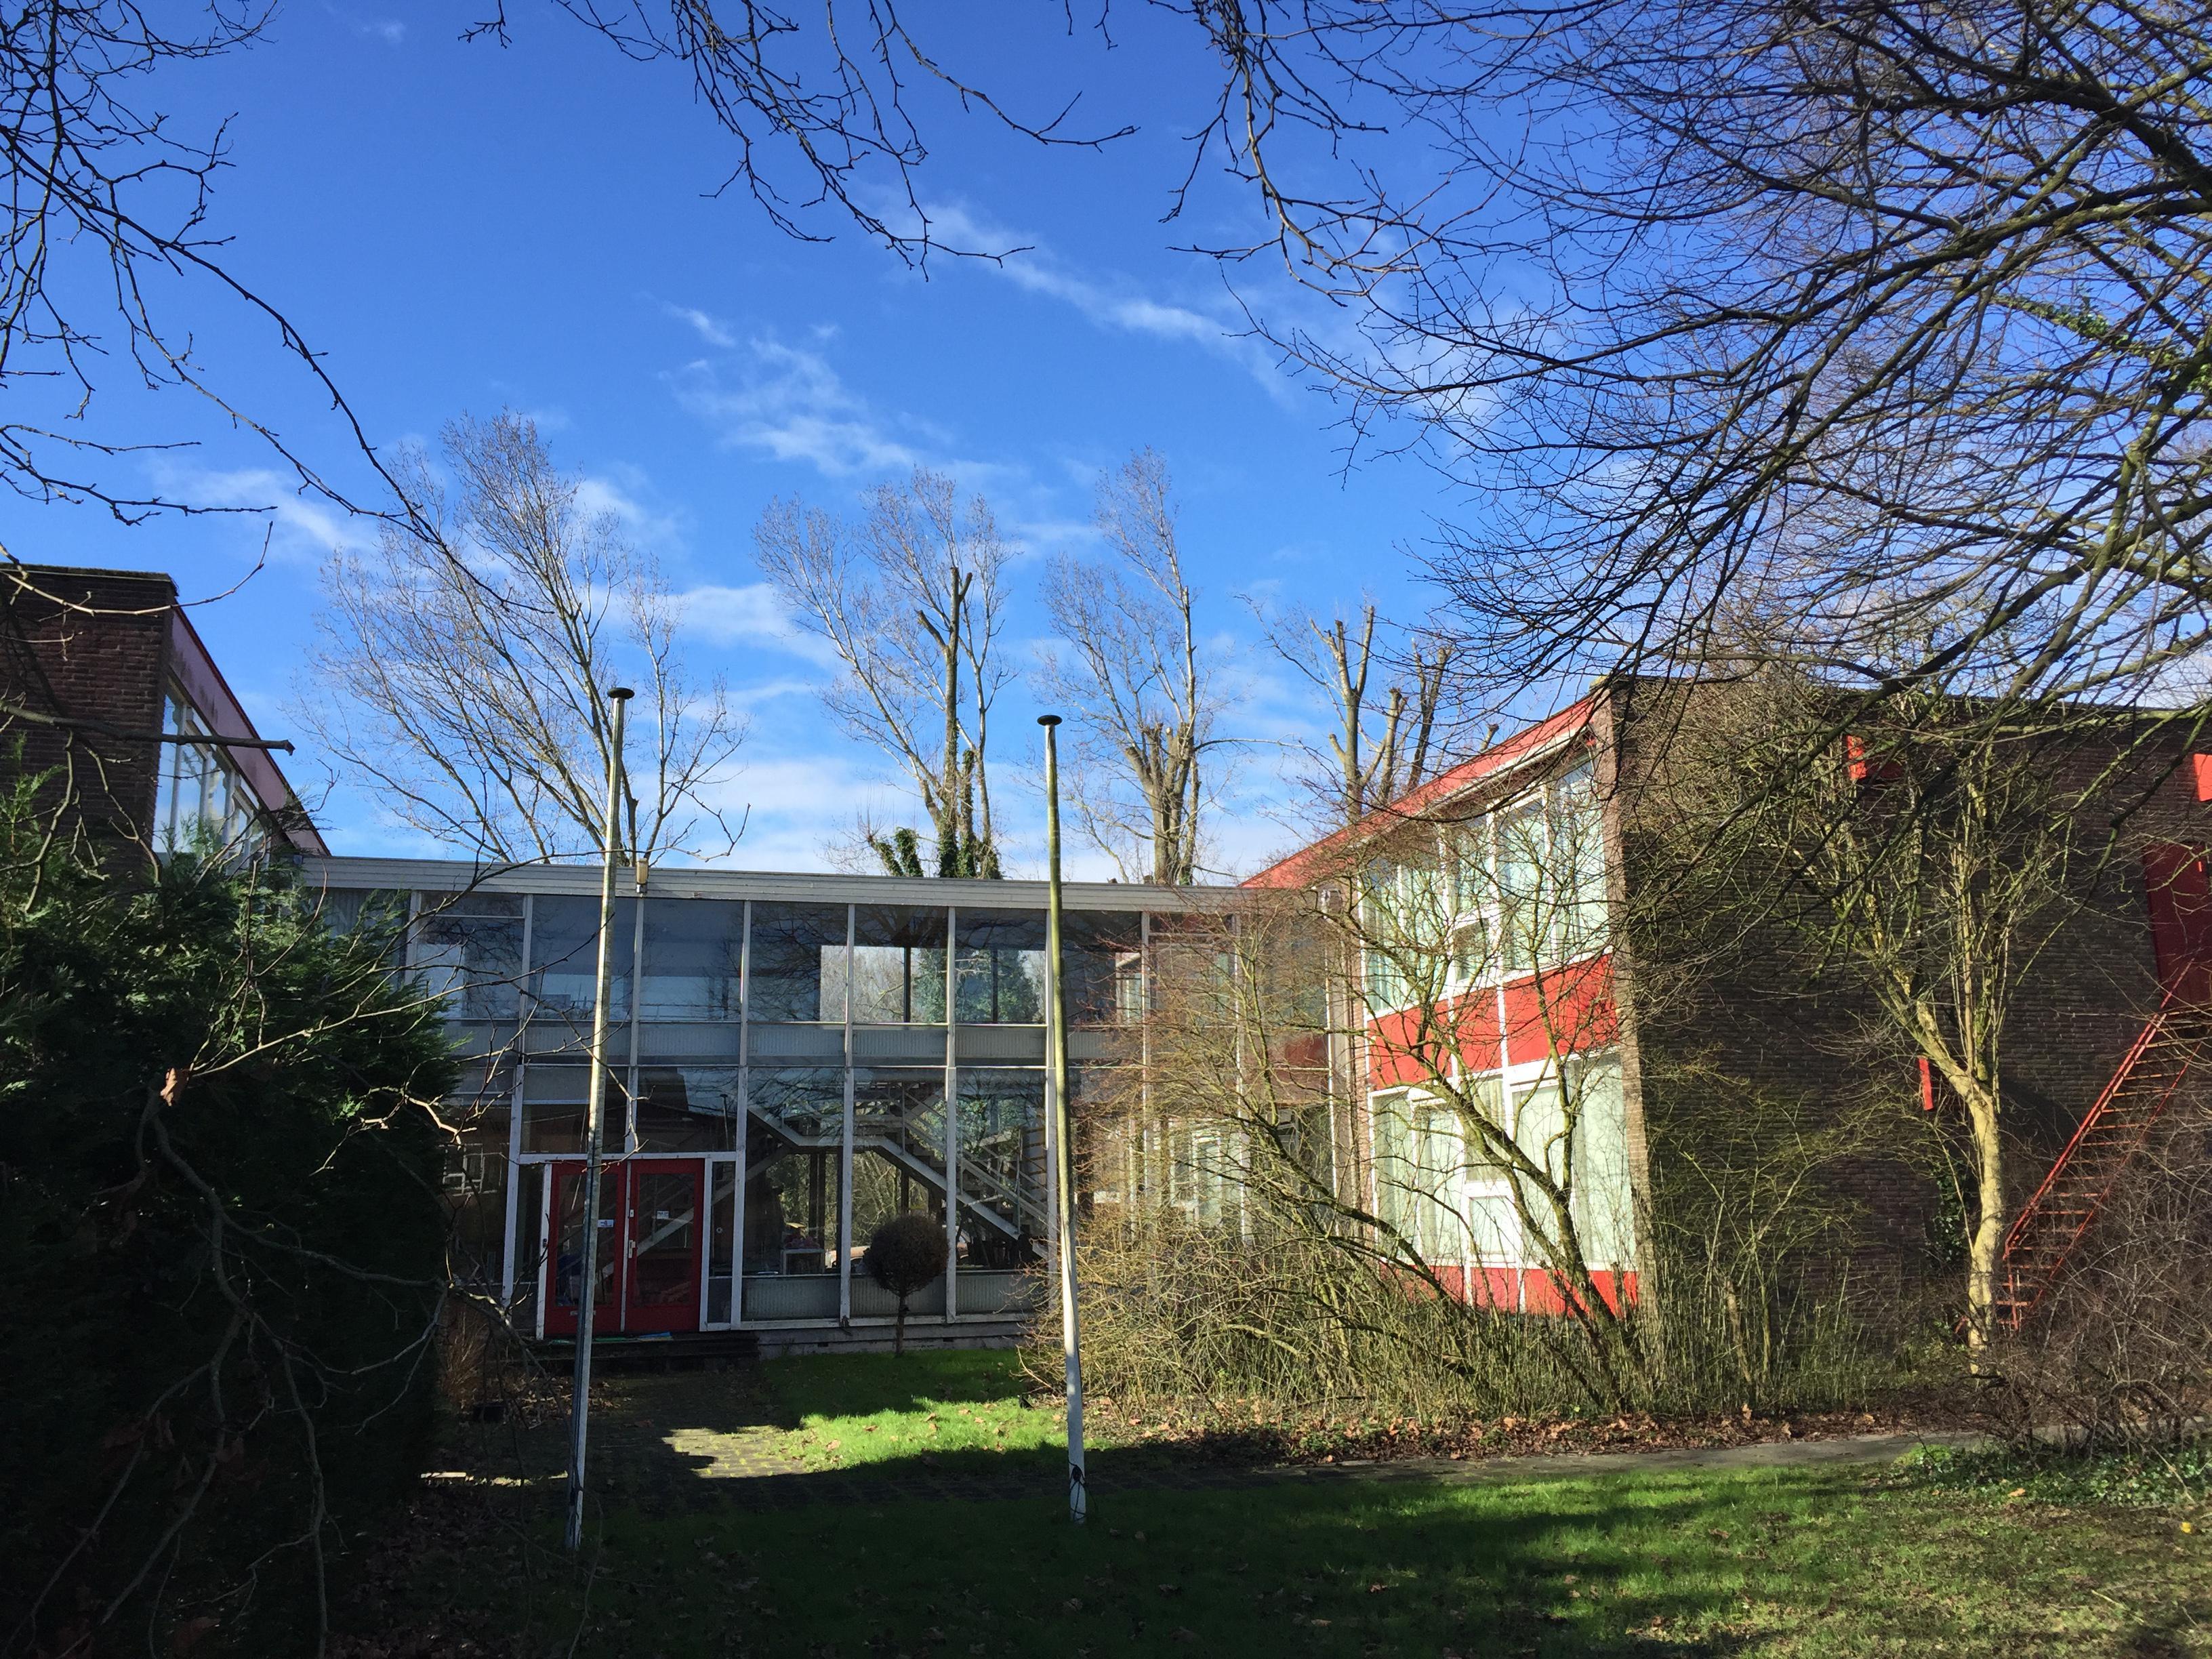 Zwanenburg krijgt er 34 woningen bij